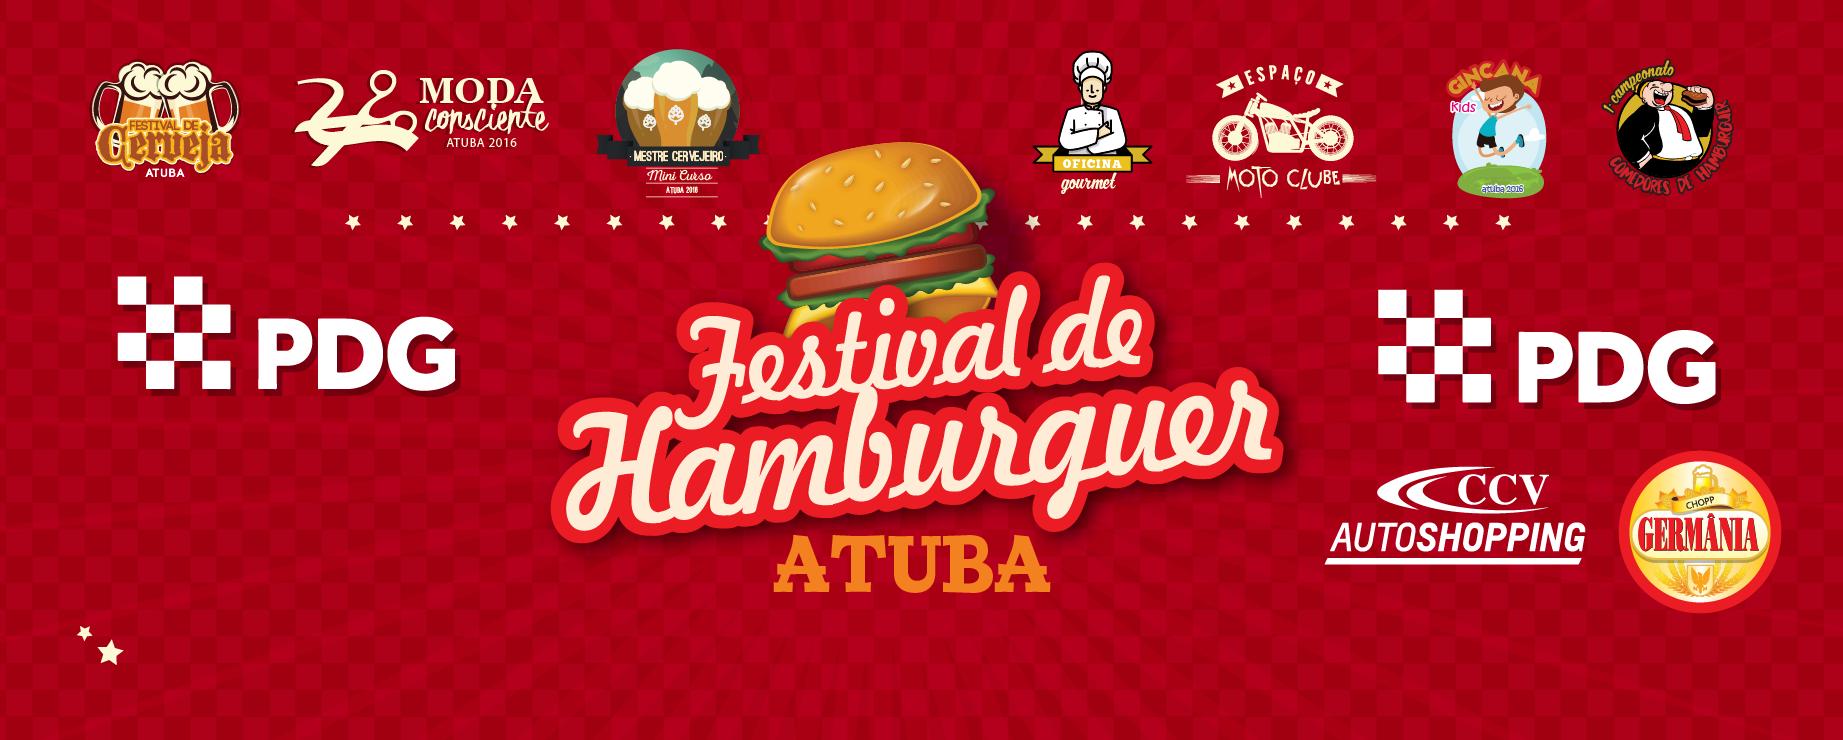 Pdg Apresenta 1º Festival Do Hamburguer Atuba